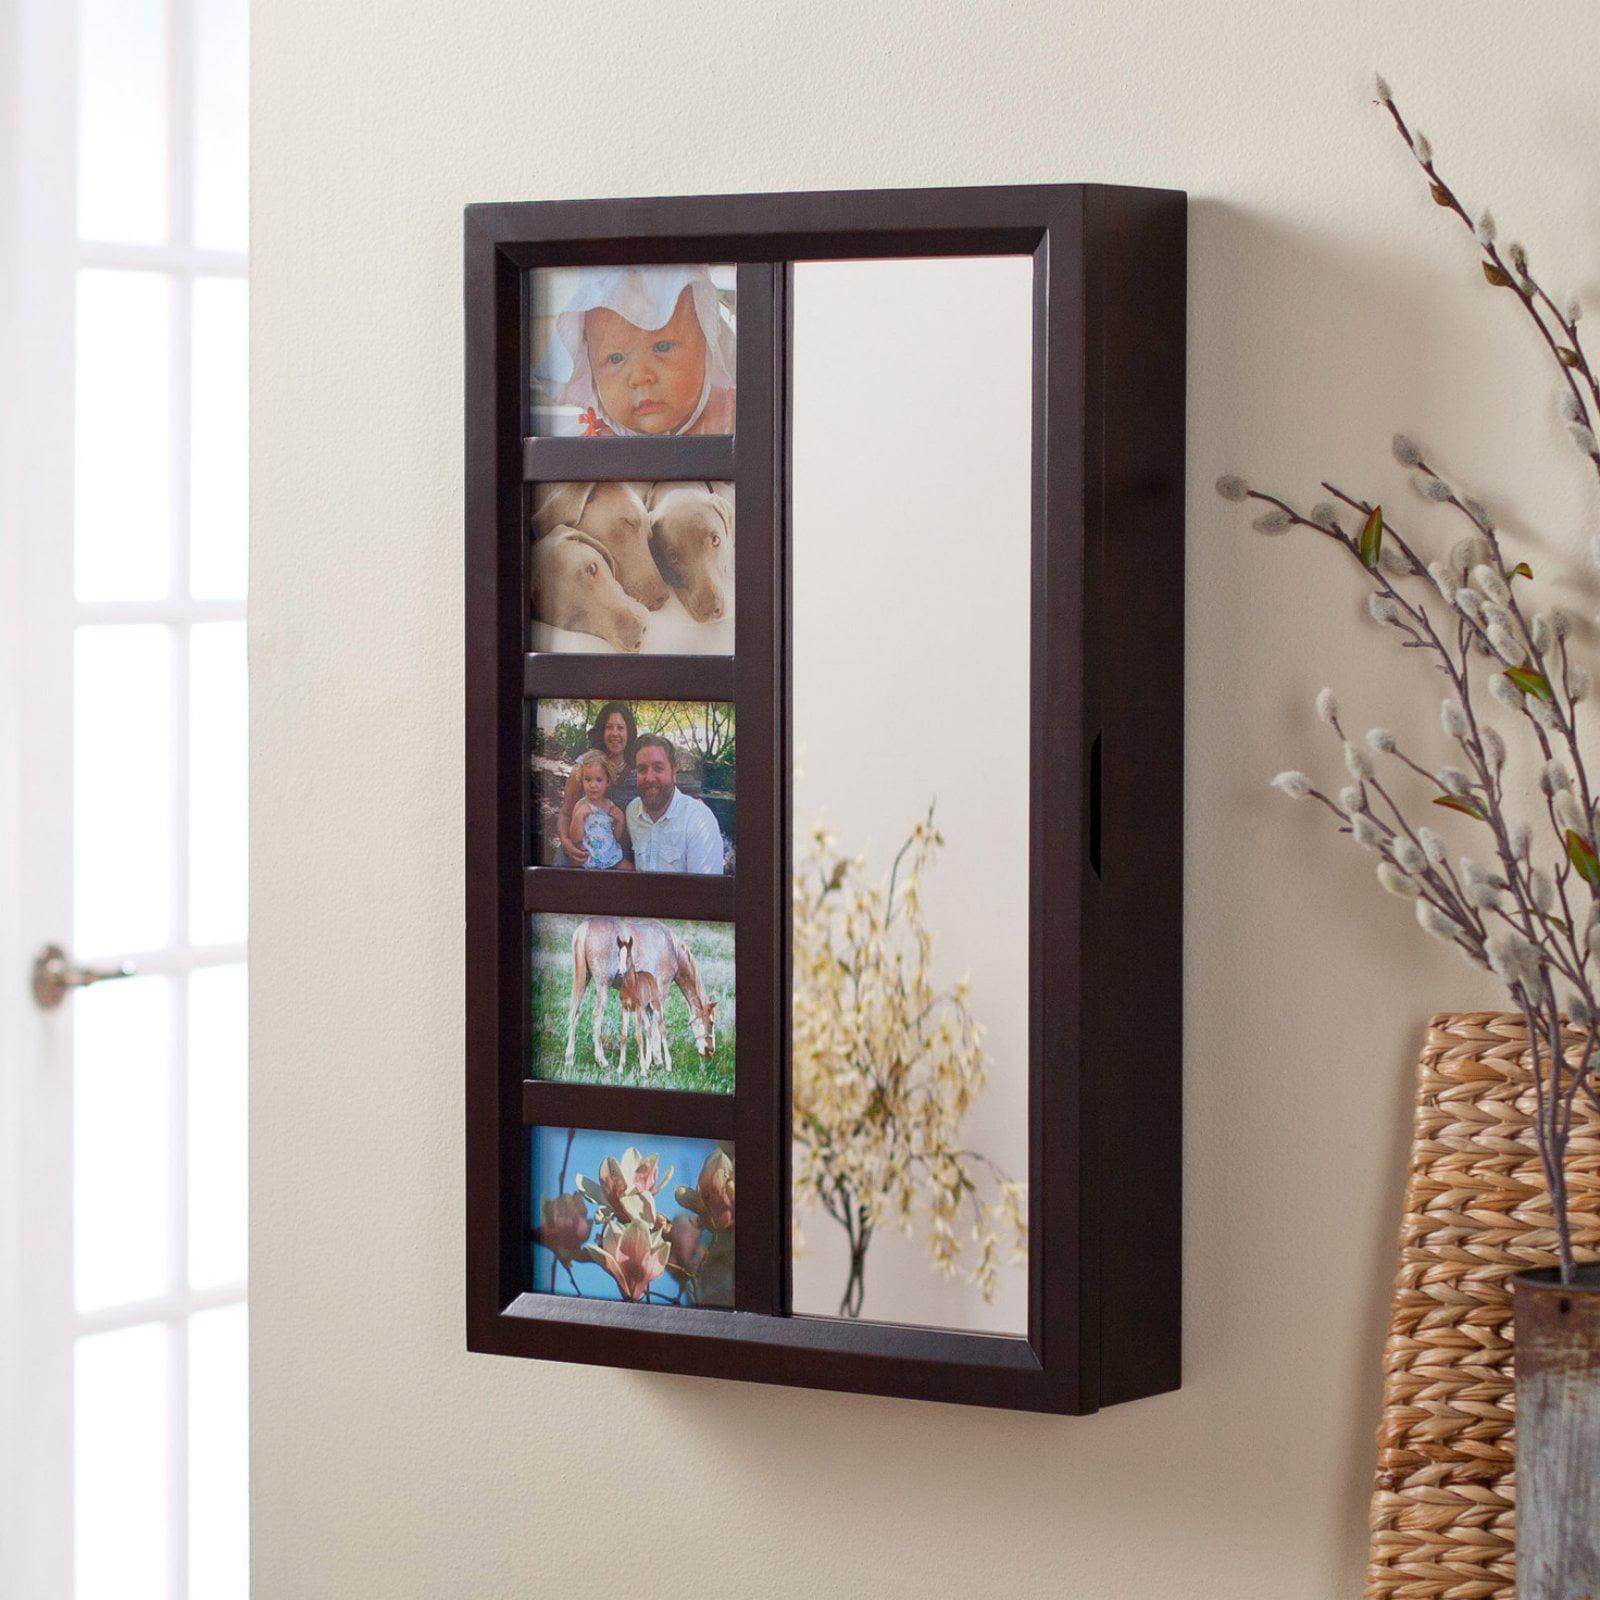 Photo Frames Wall Mount Jewelry Armoire Mirror - Espresso - 16W x 24H in.